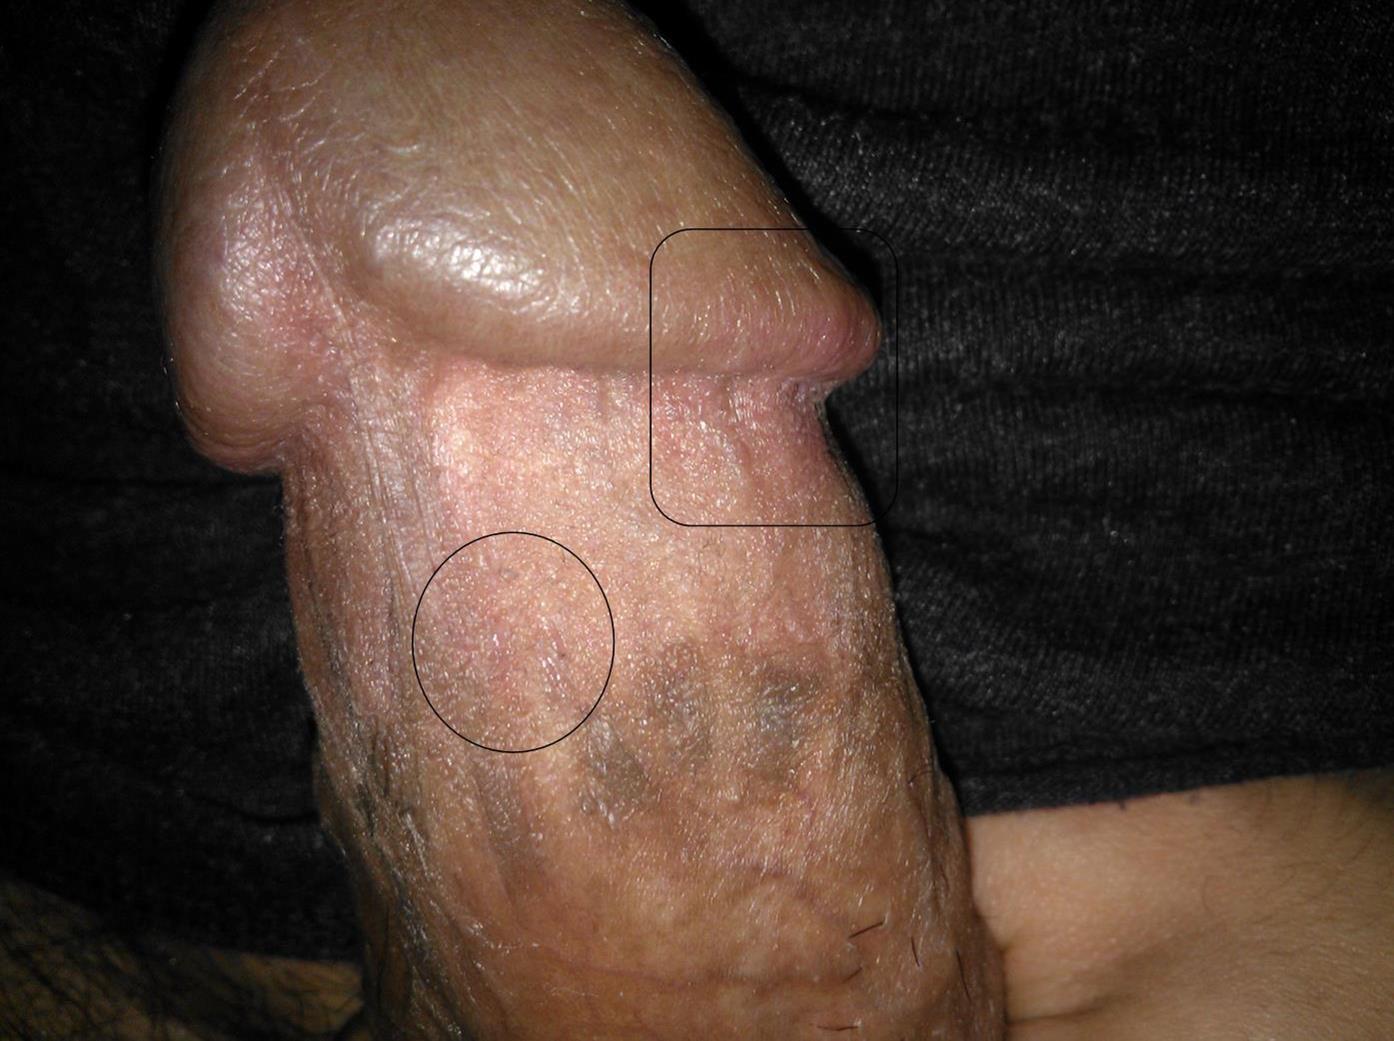 Lick my legs shirt